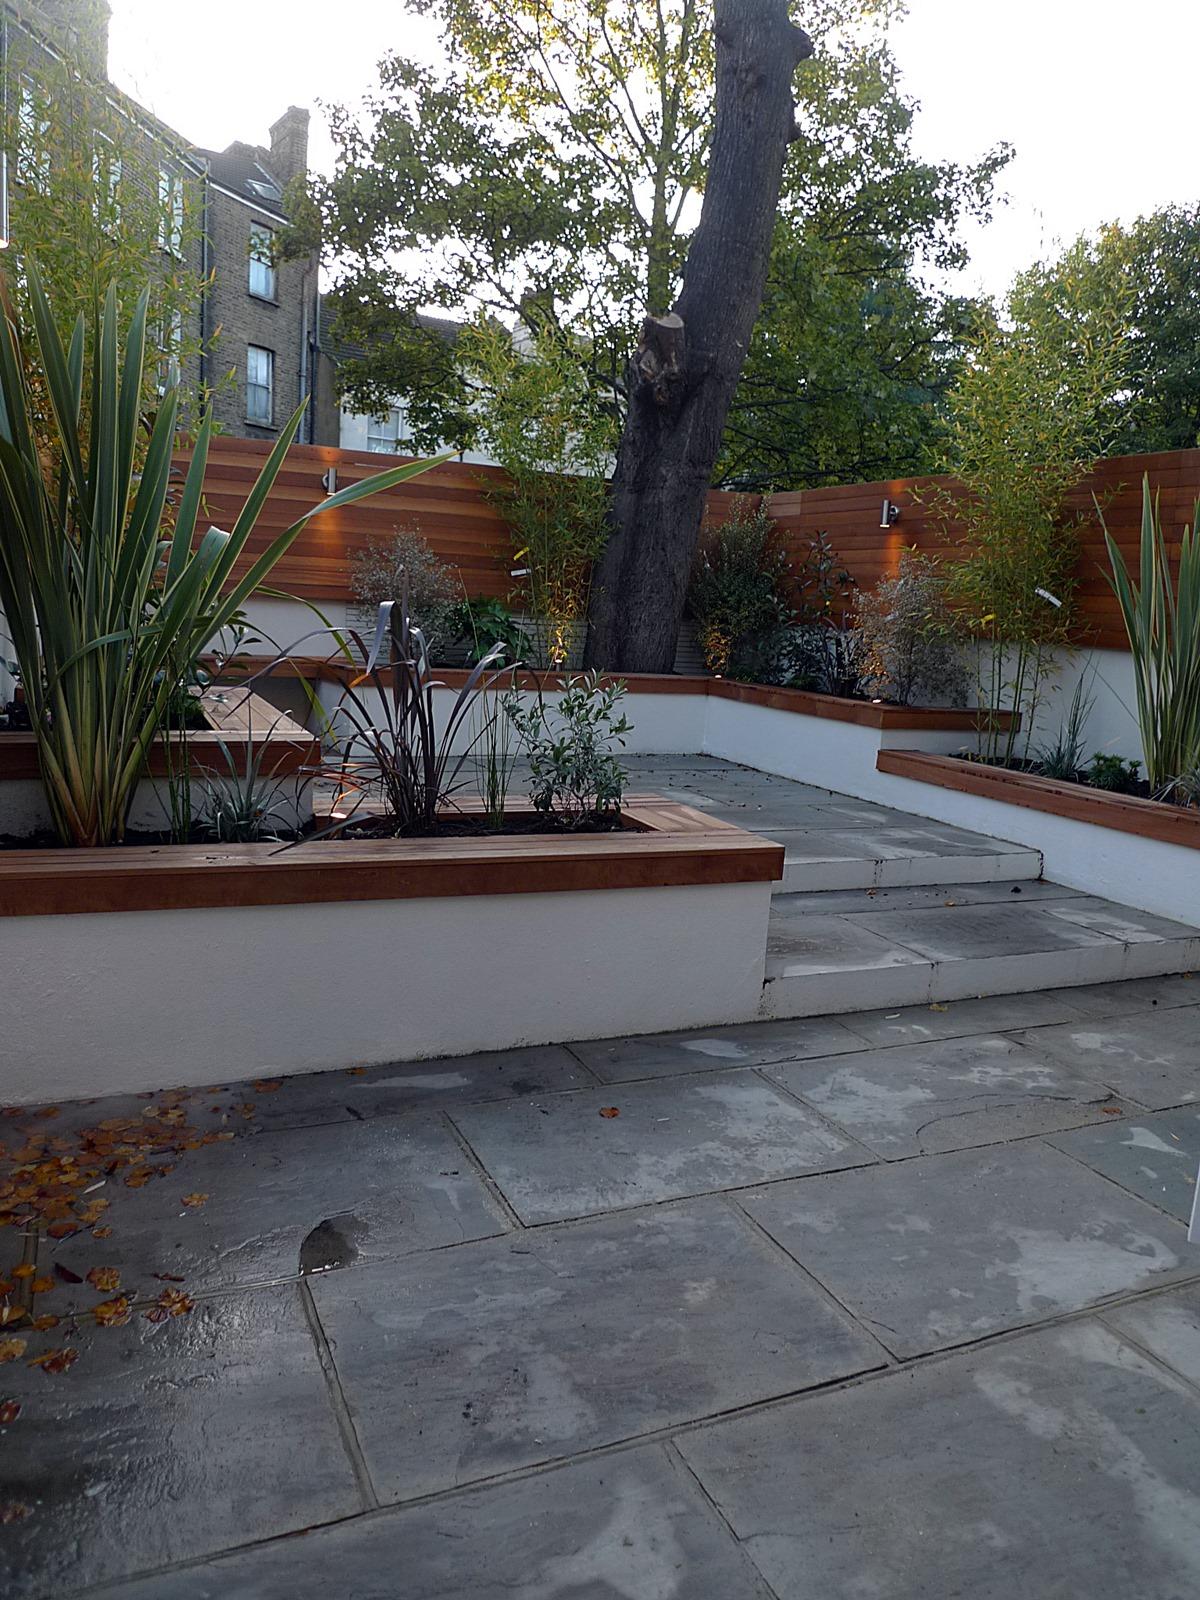 modern london courtyard low maintenance urban outdoor indoor living garden space paving screens planting bench raised beds (4)